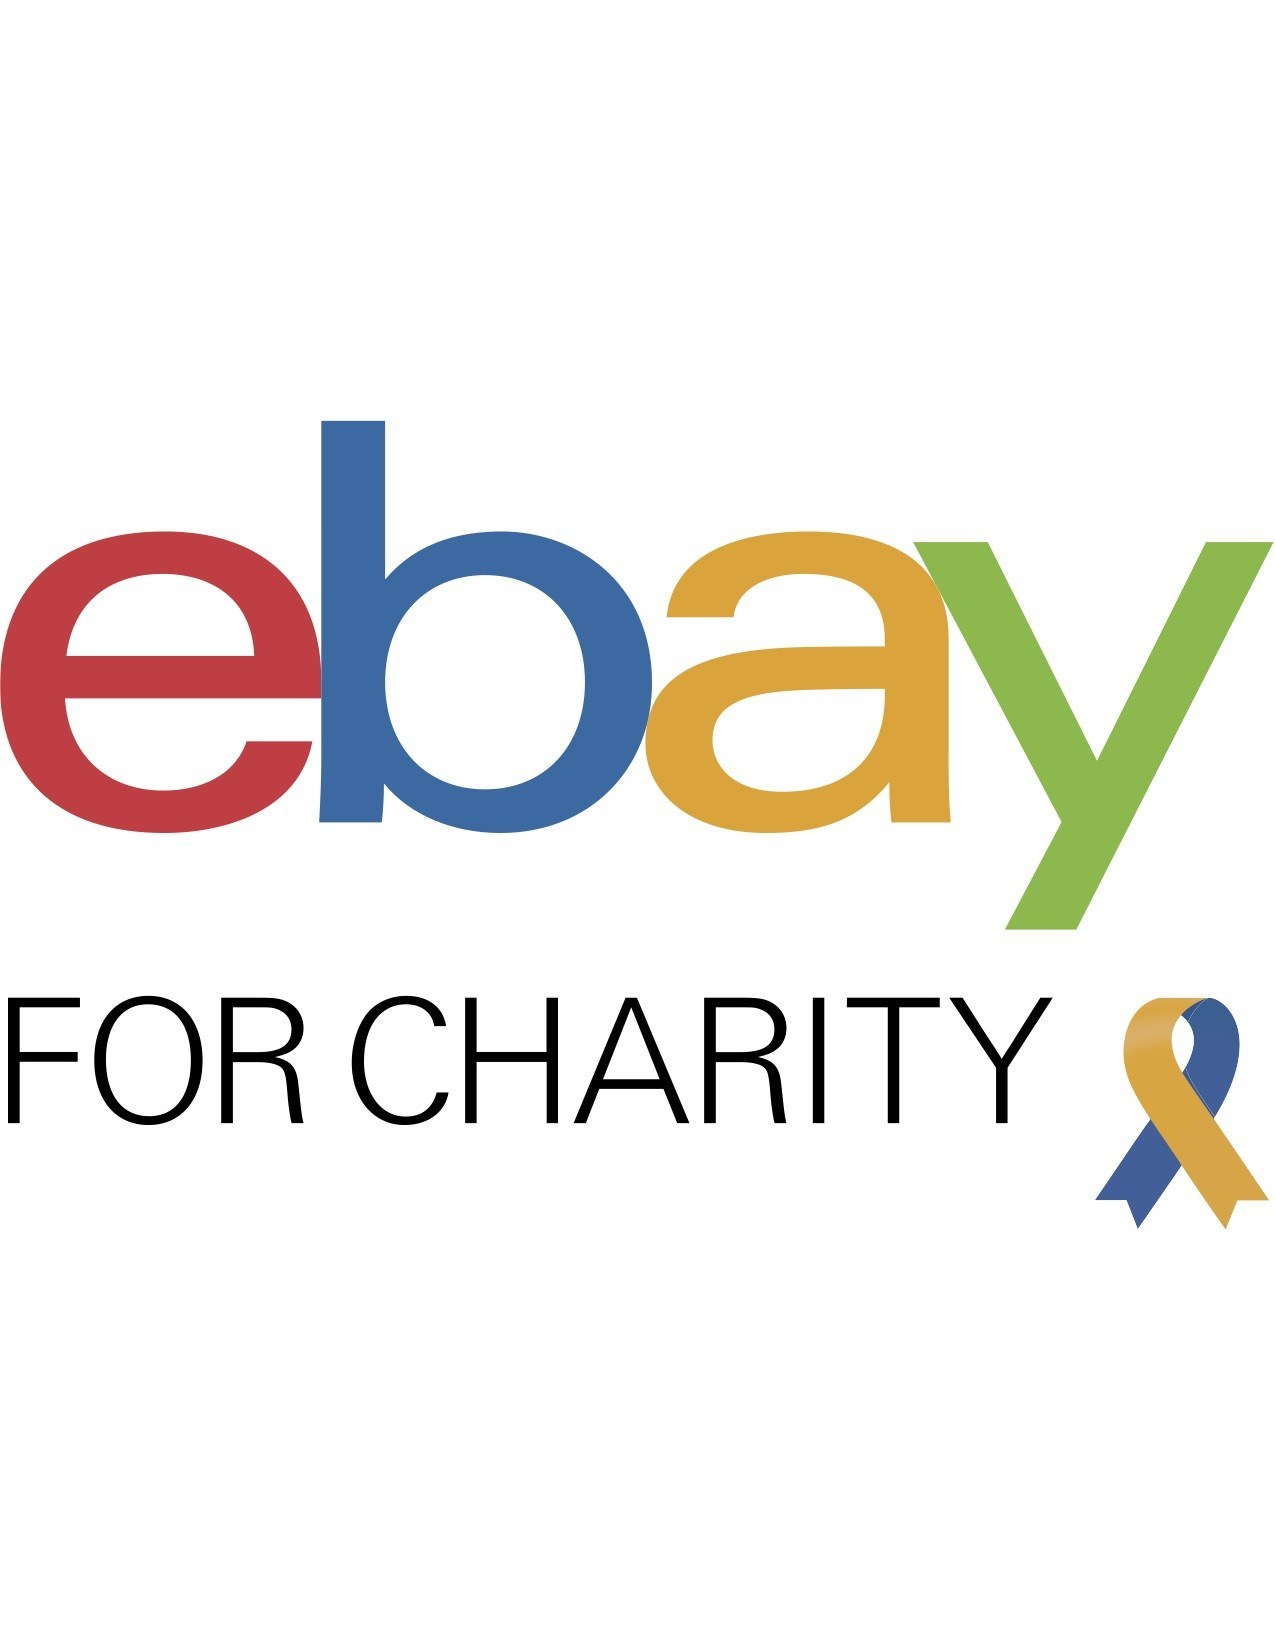 eBay for Charity (PRNewsfoto/eBay for Charity)